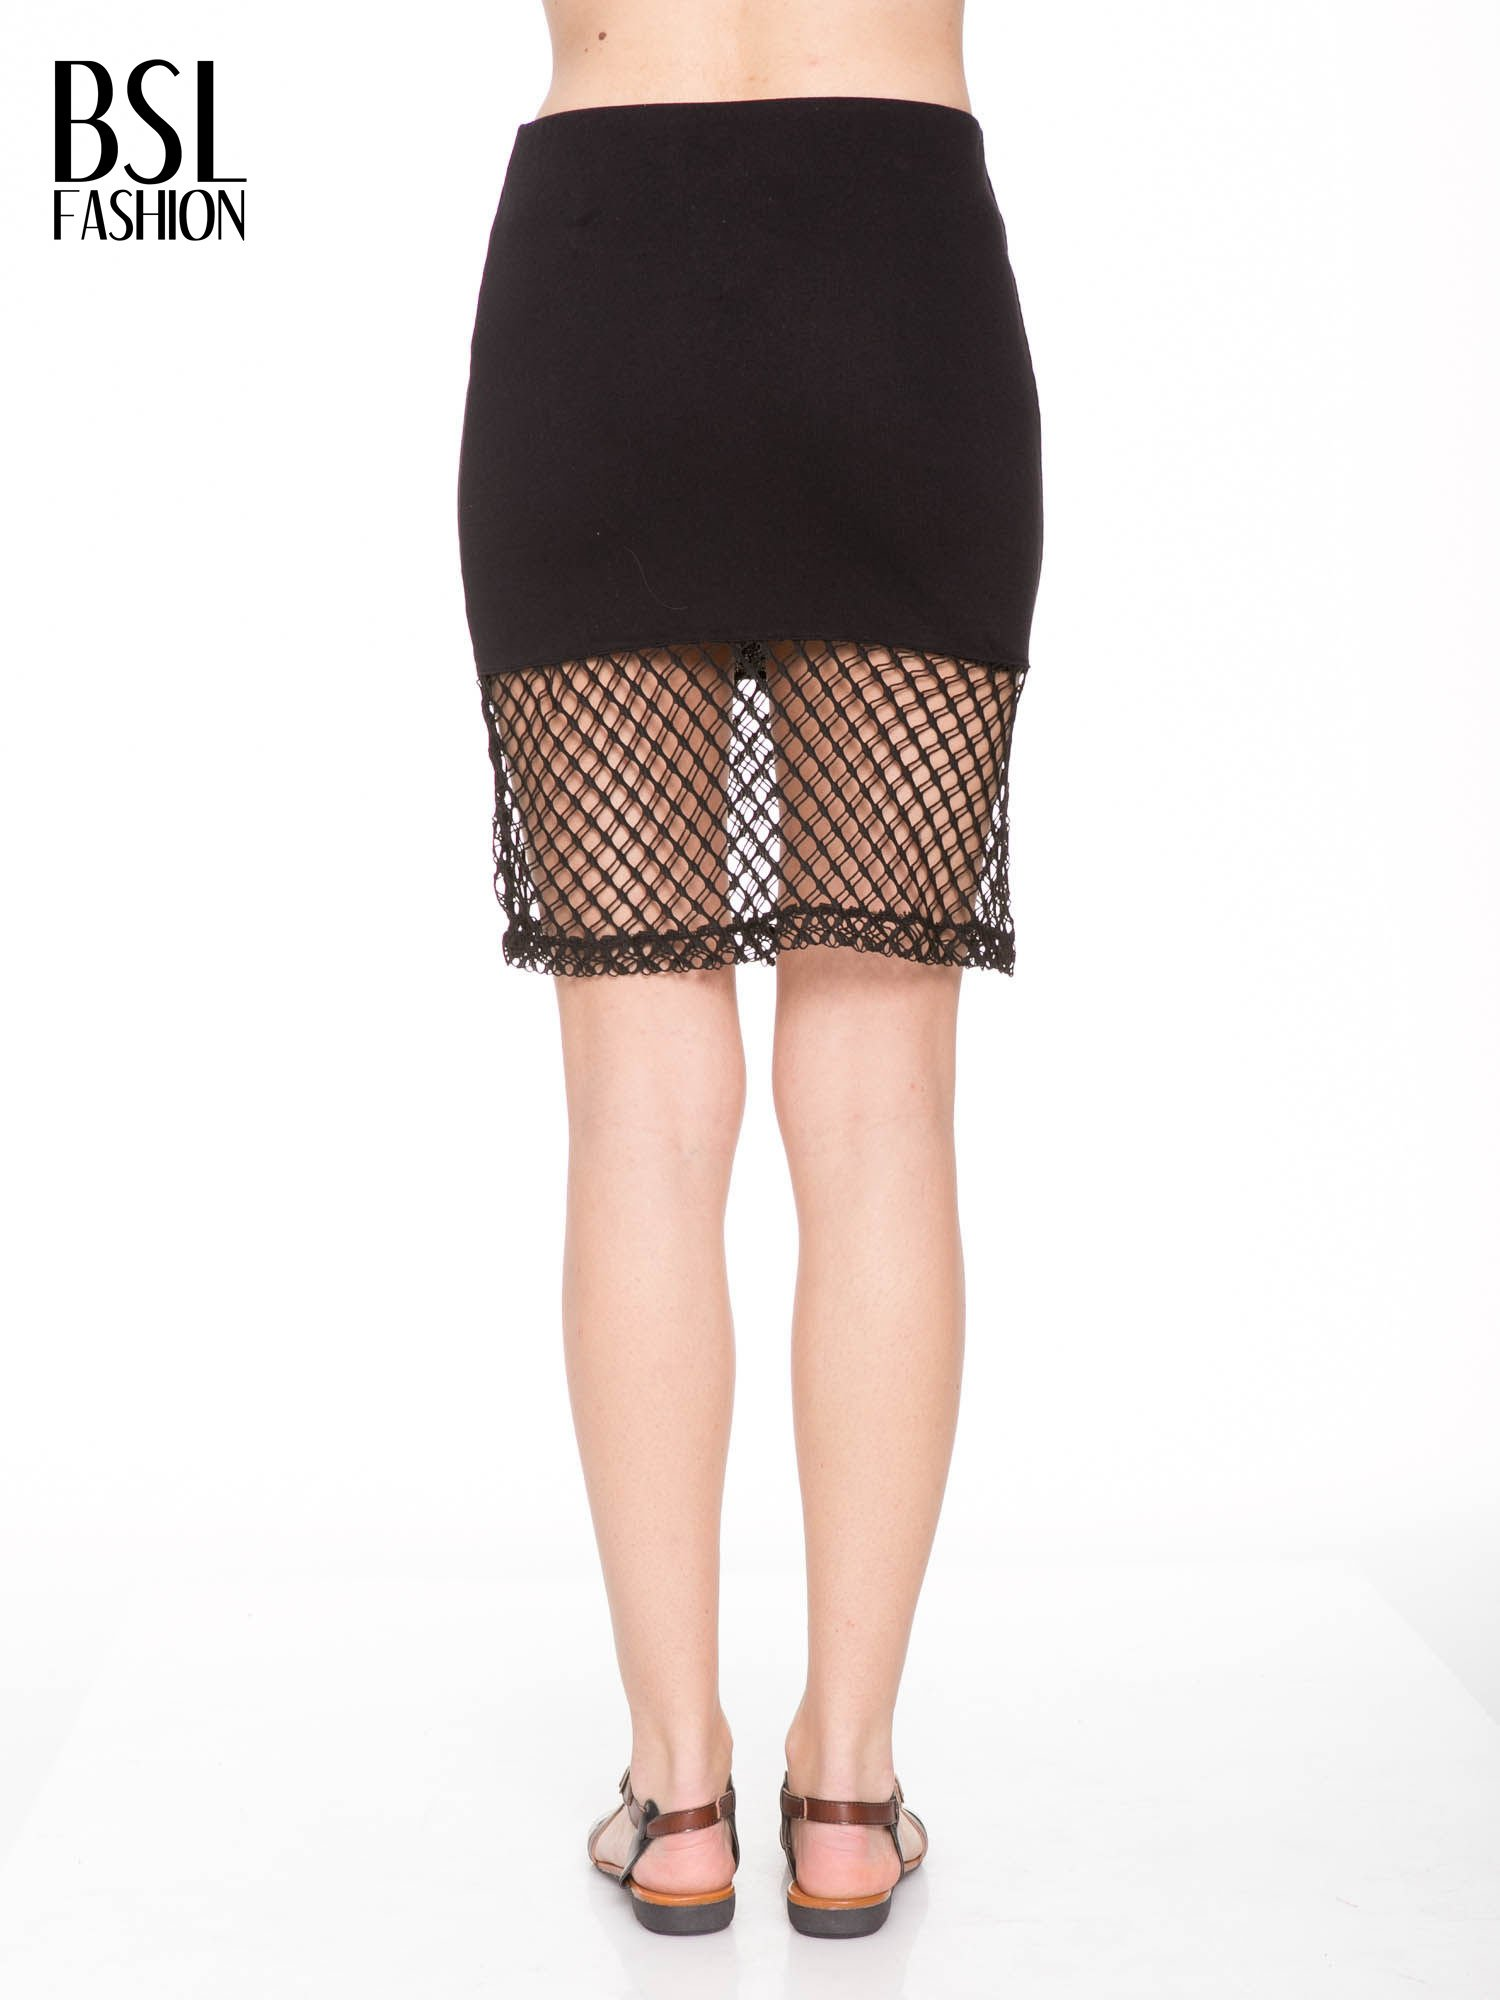 Czarna spódnica do kolan z siatki                                  zdj.                                  3